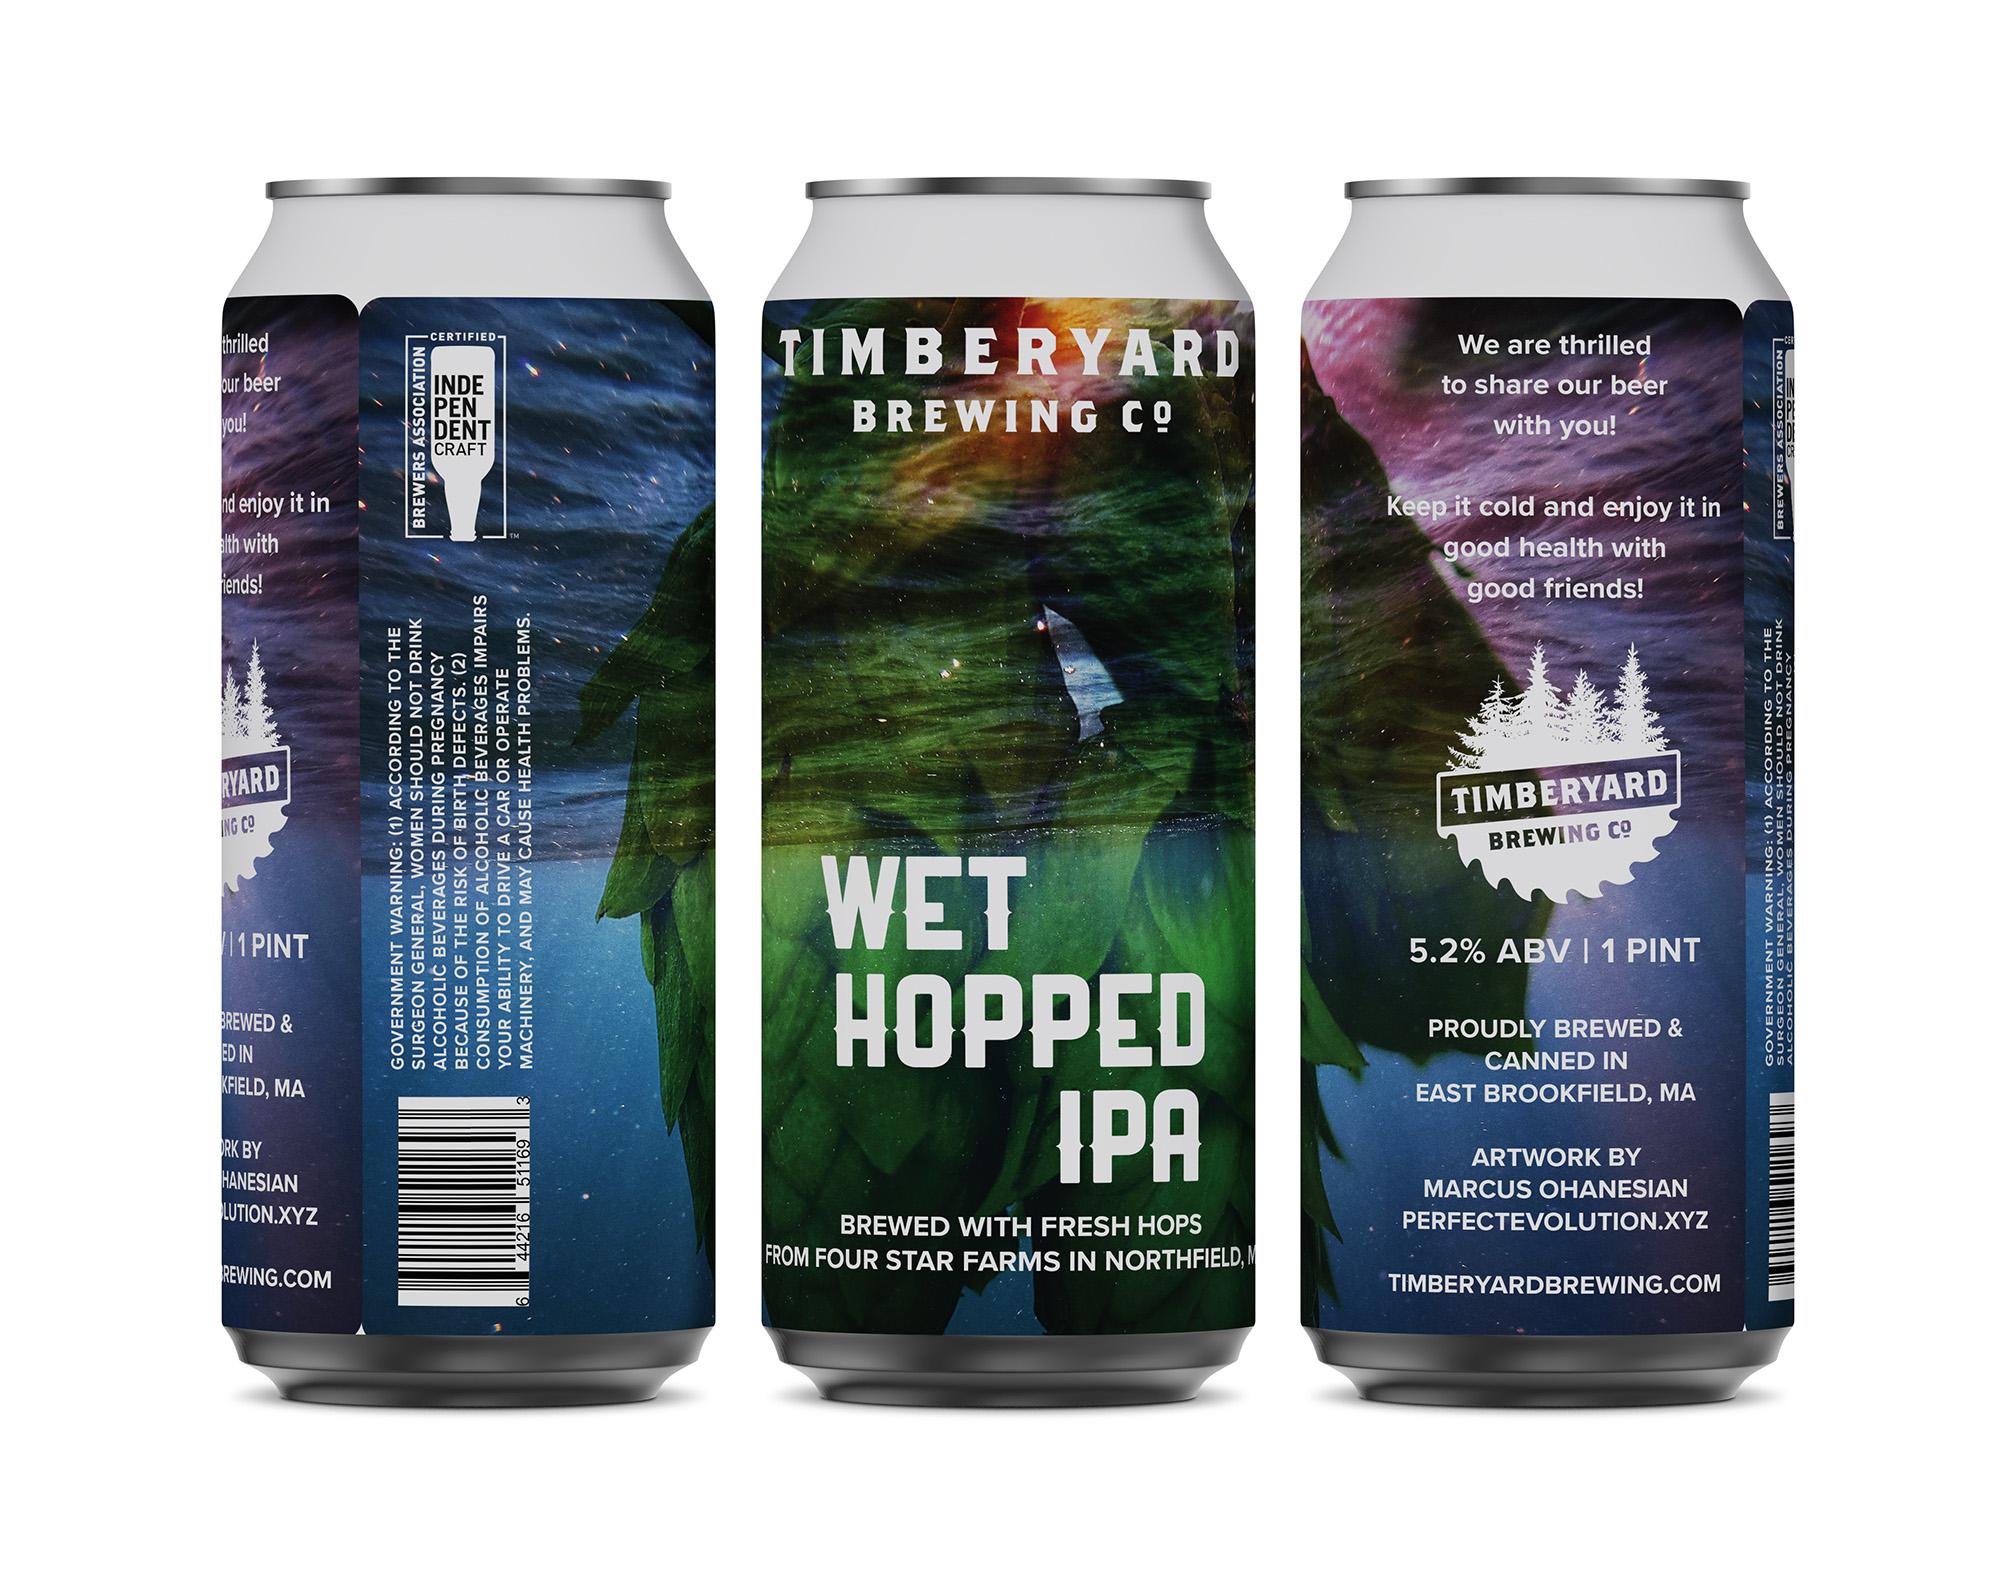 Timberyard Brewing Co - Wet Hopped IPA Can Design